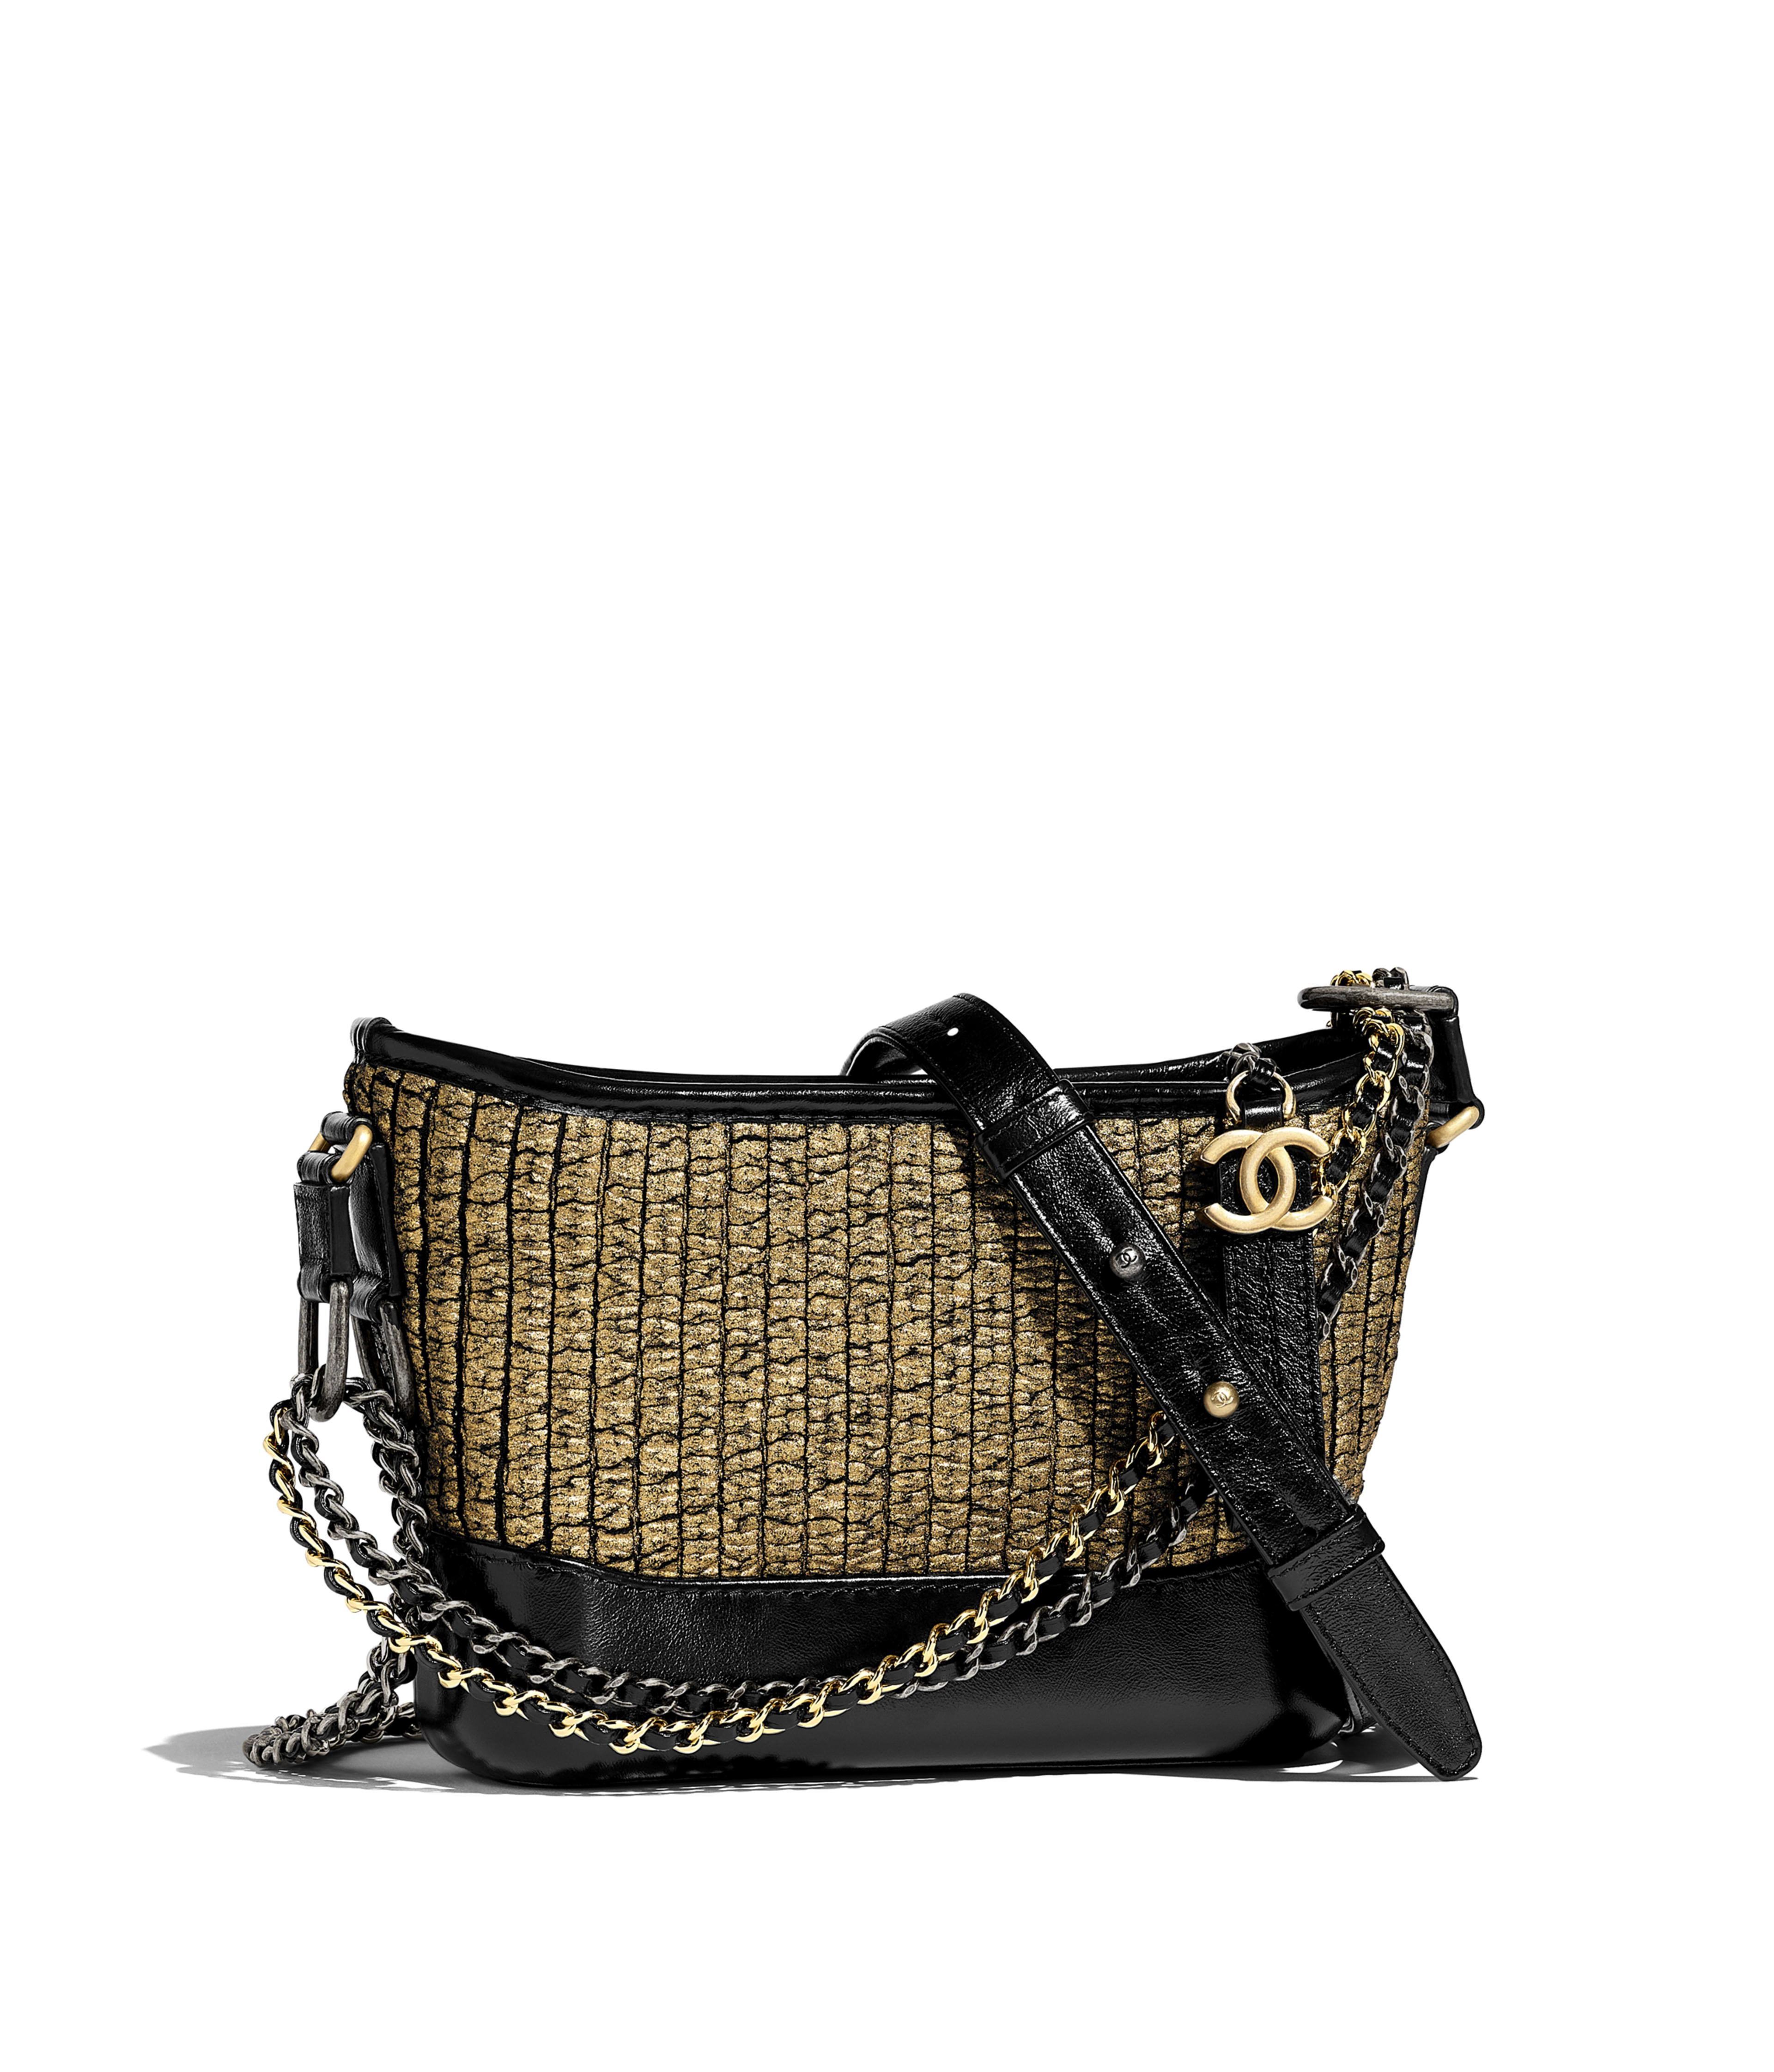 b770aae4b2 CHANEL'S GABRIELLE Small Hobo Bag Tweed, Calfskin, Gold-Tone & Silver-Tone  Metal, Gold & Black Ref. A91810B00746N4790